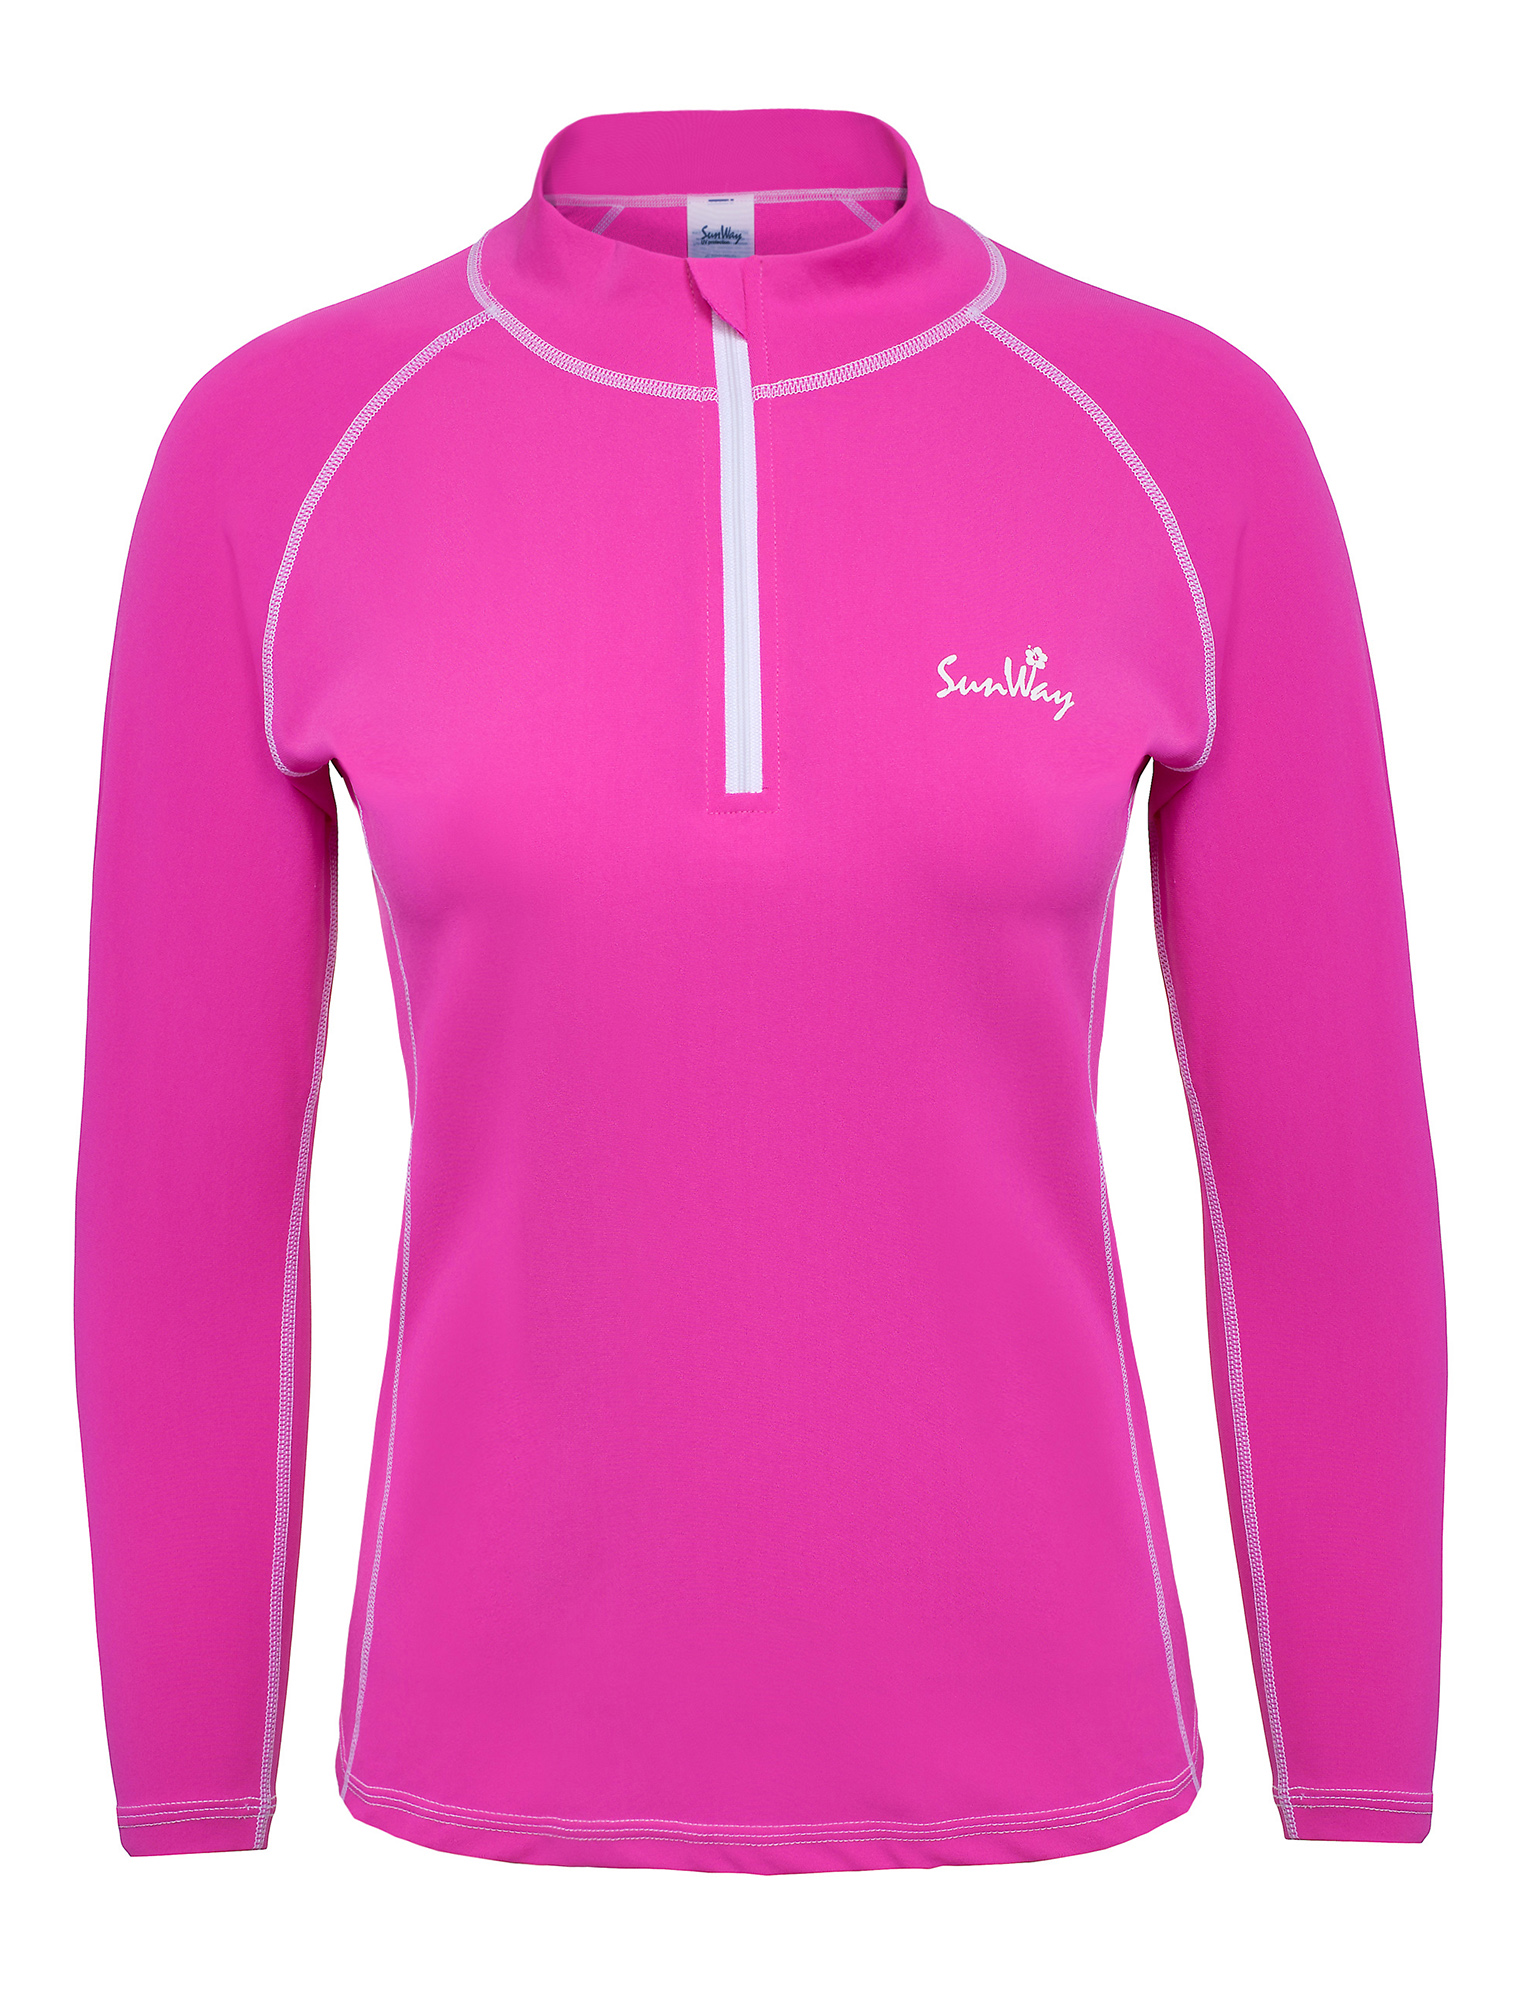 Women 39 s long sleeve pink uv swim shirt for Uv shirts long sleeve